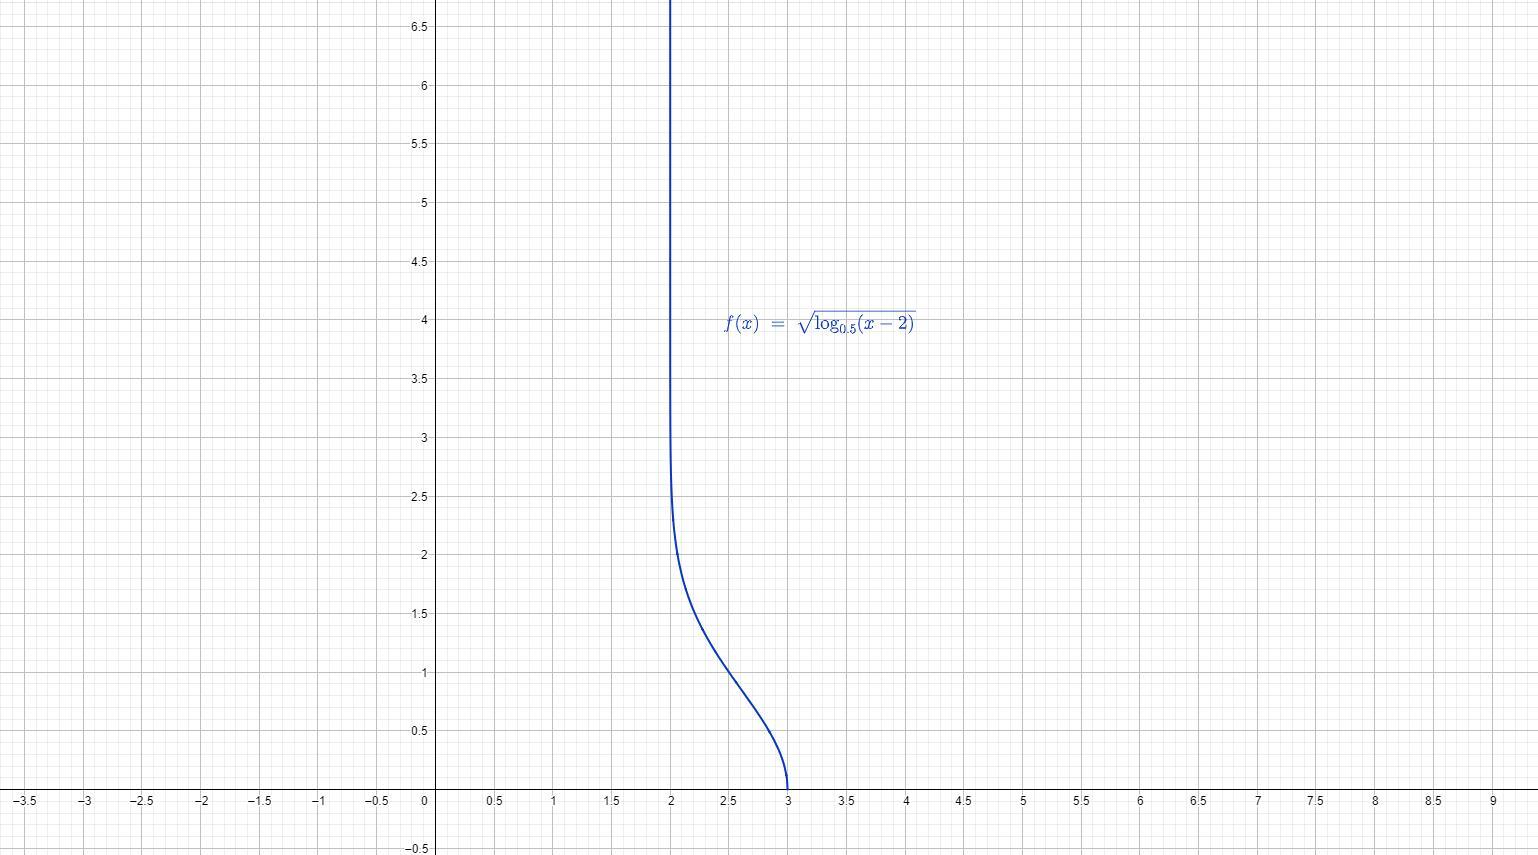 Analisi Matematica - Dominio di funzione - AM009-02